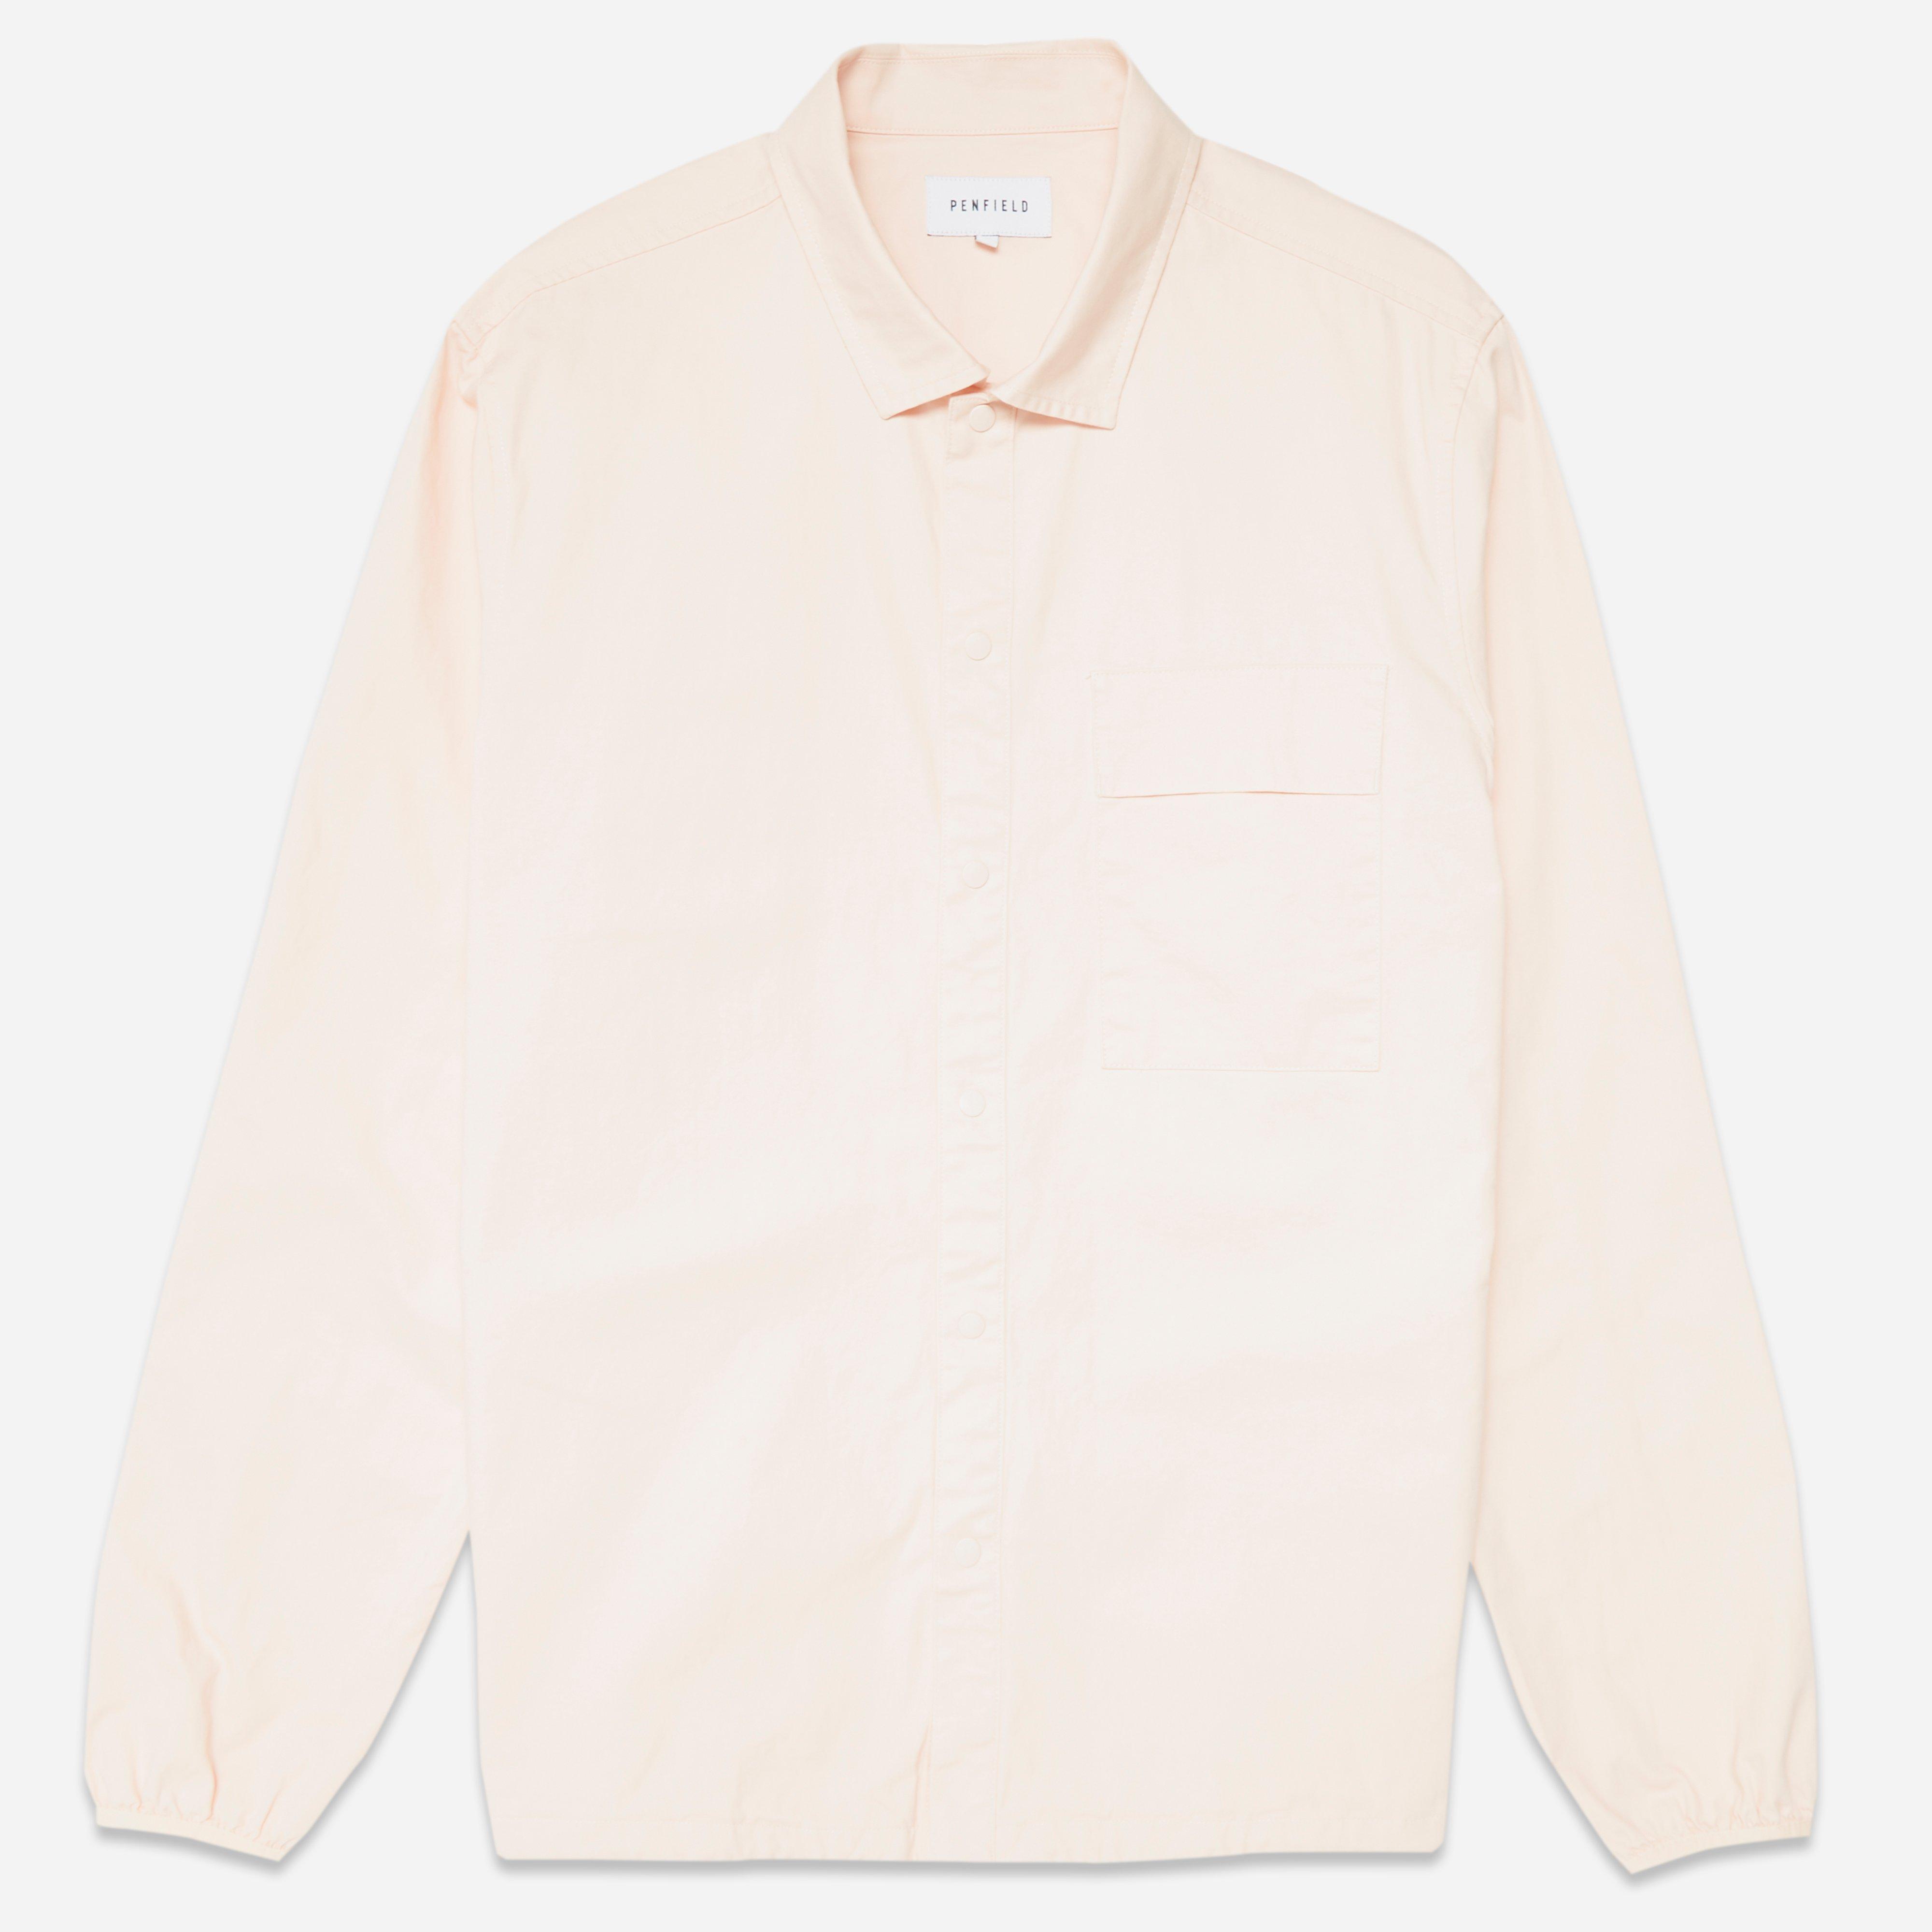 Penfield Blackstone Shirt